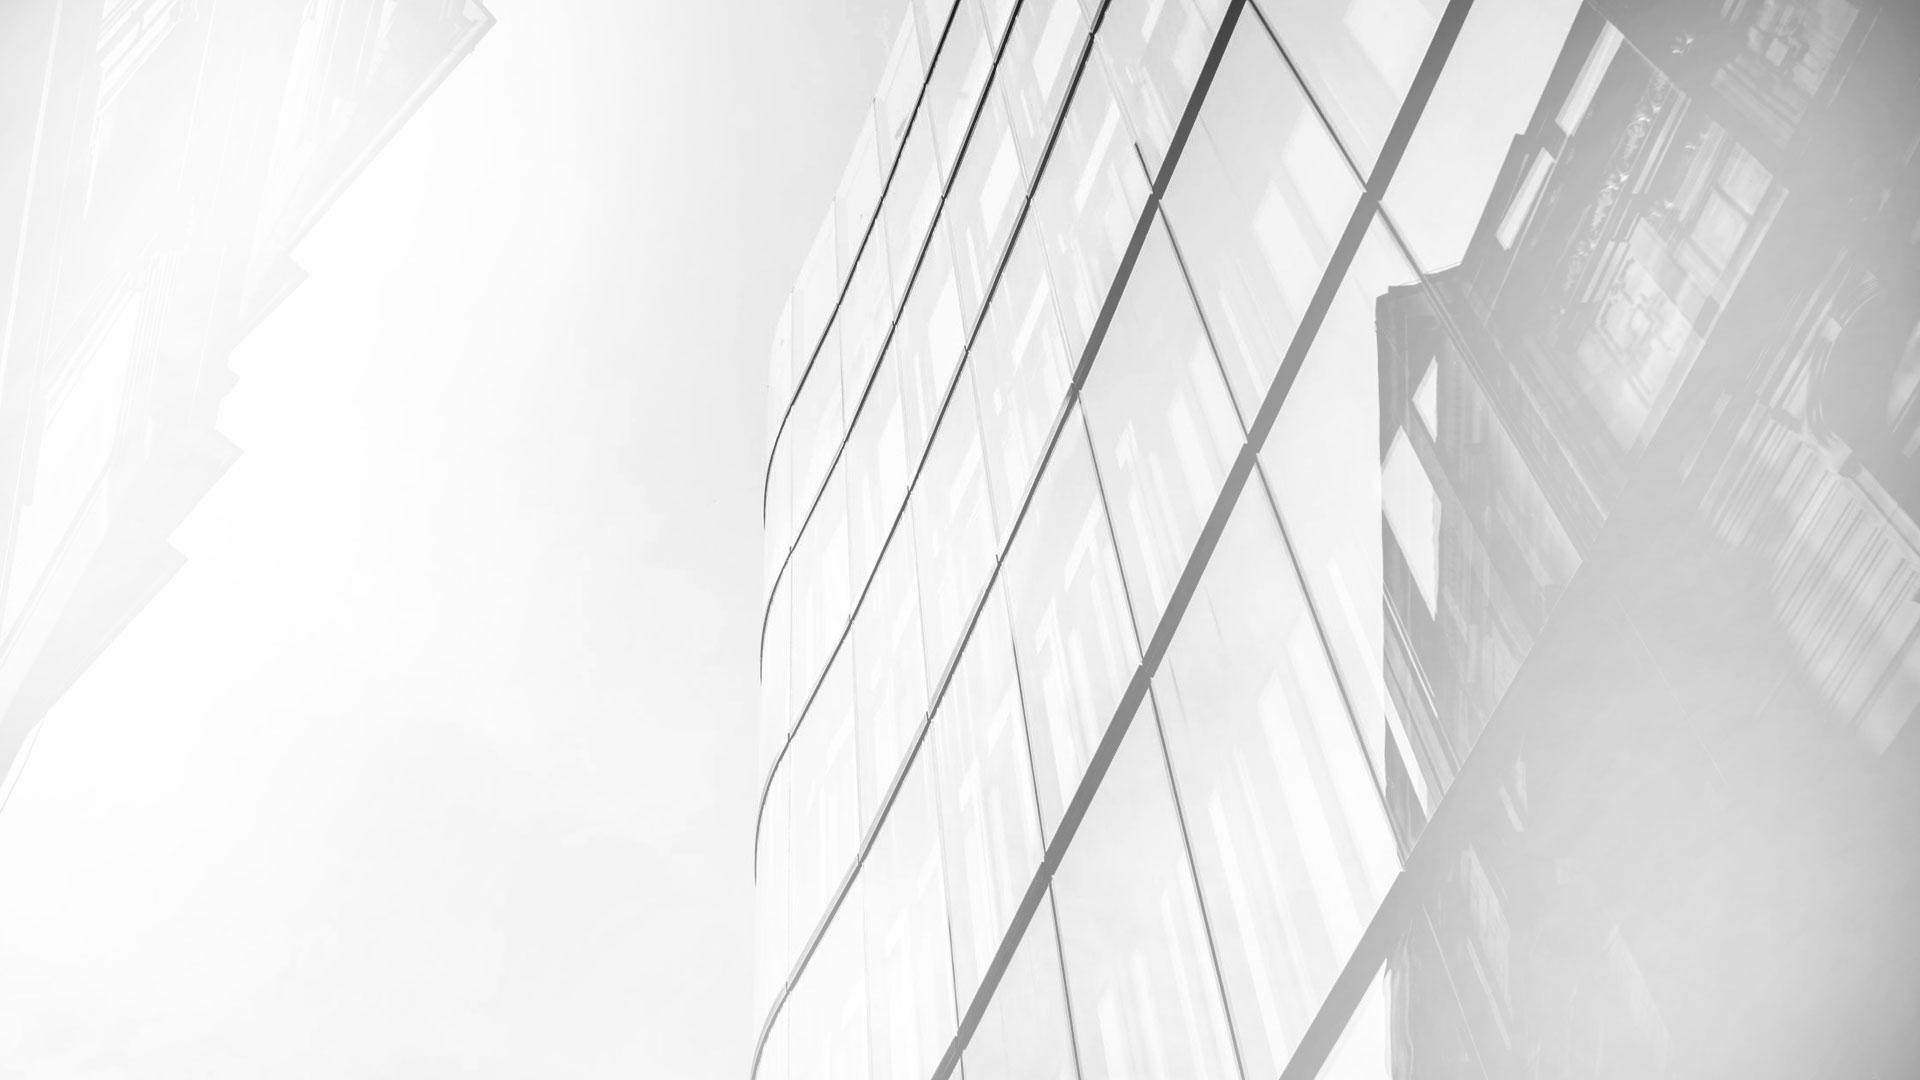 building-pattern-banner.jpg